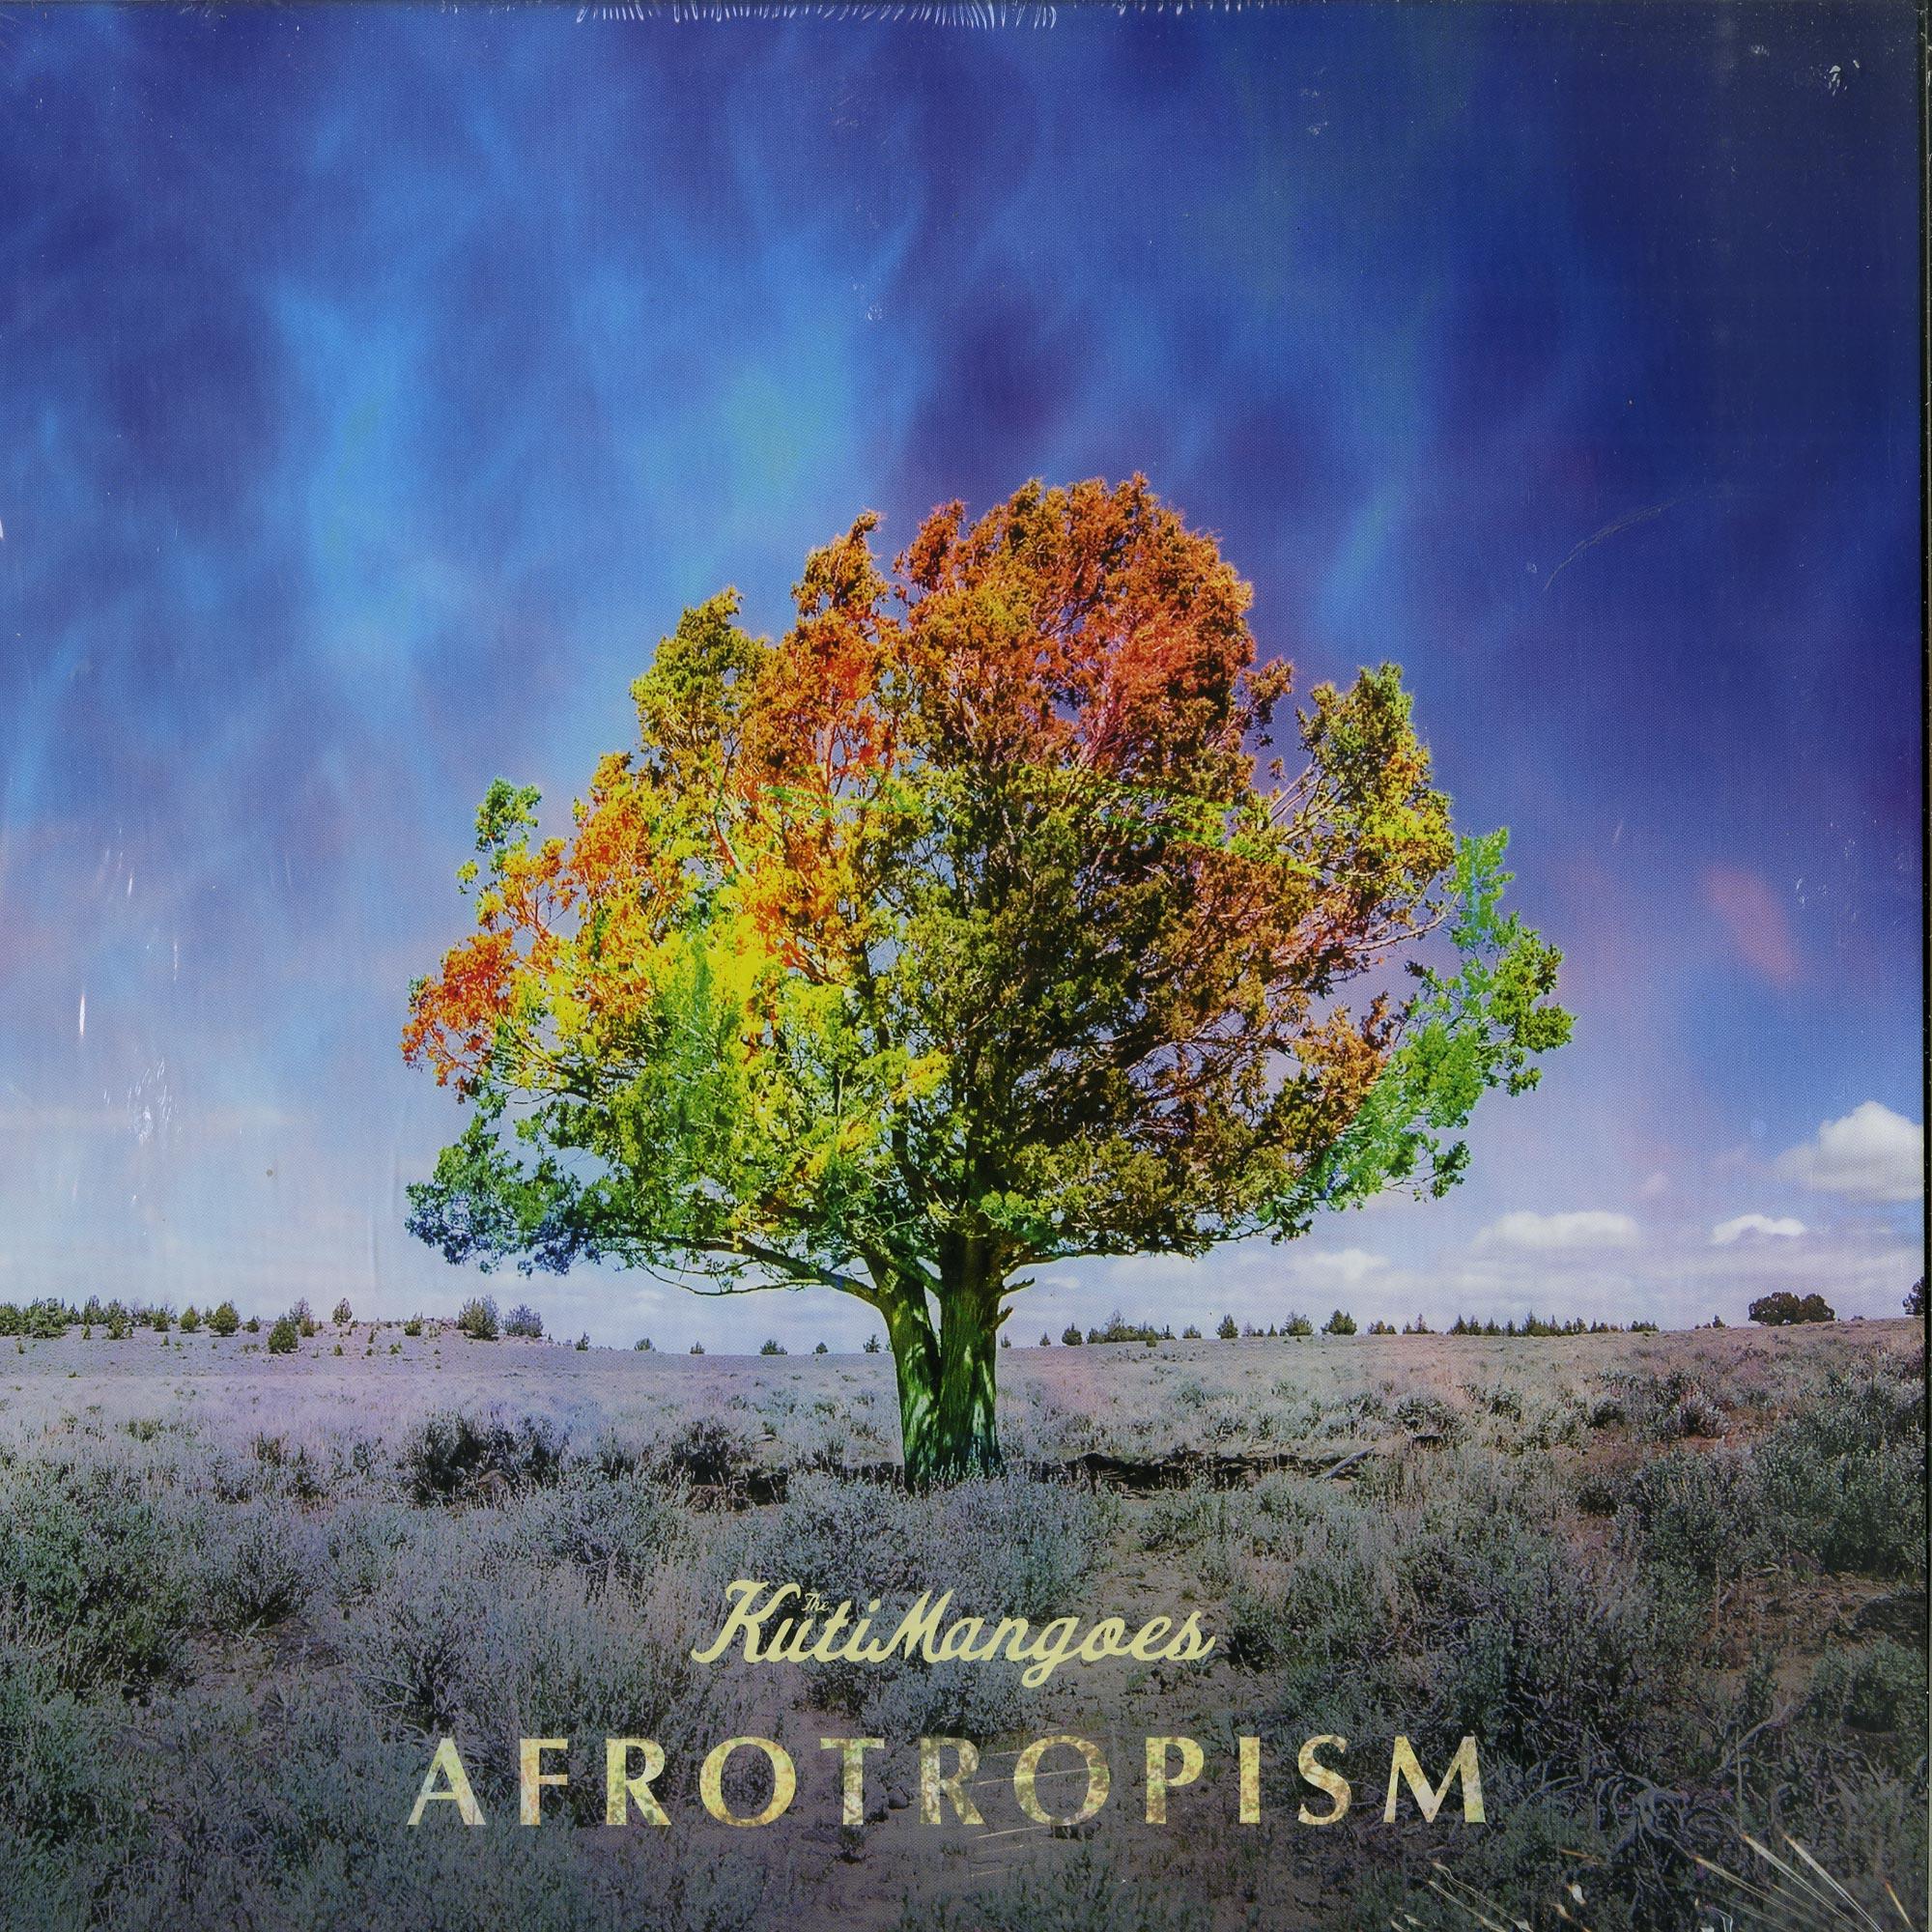 The Kuti Mangoes - AFROTROPISM